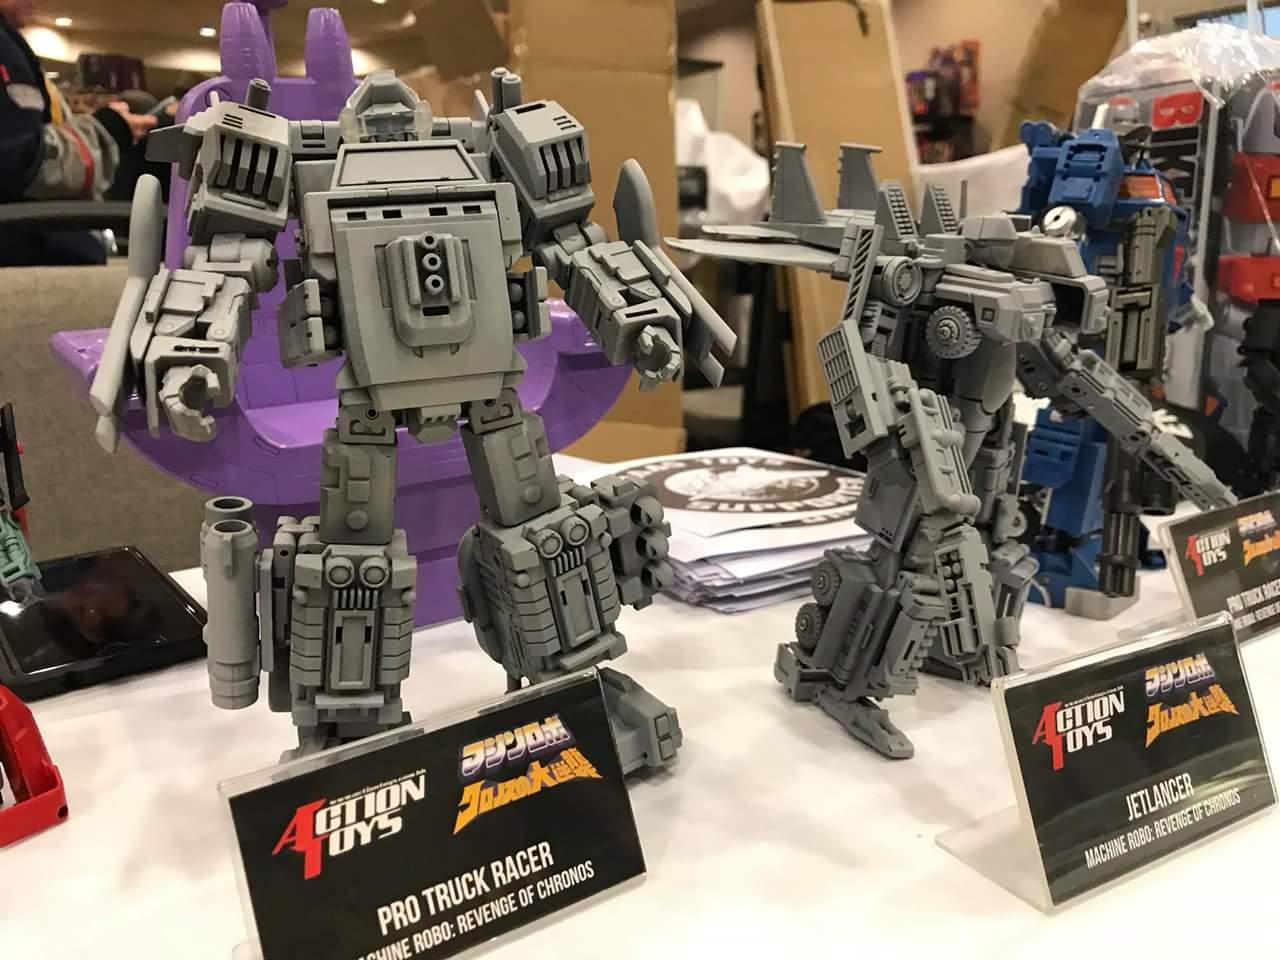 Gobots - Machine Robo ― Dessin Animé + Jouets  - Page 8 J0qkscak_o